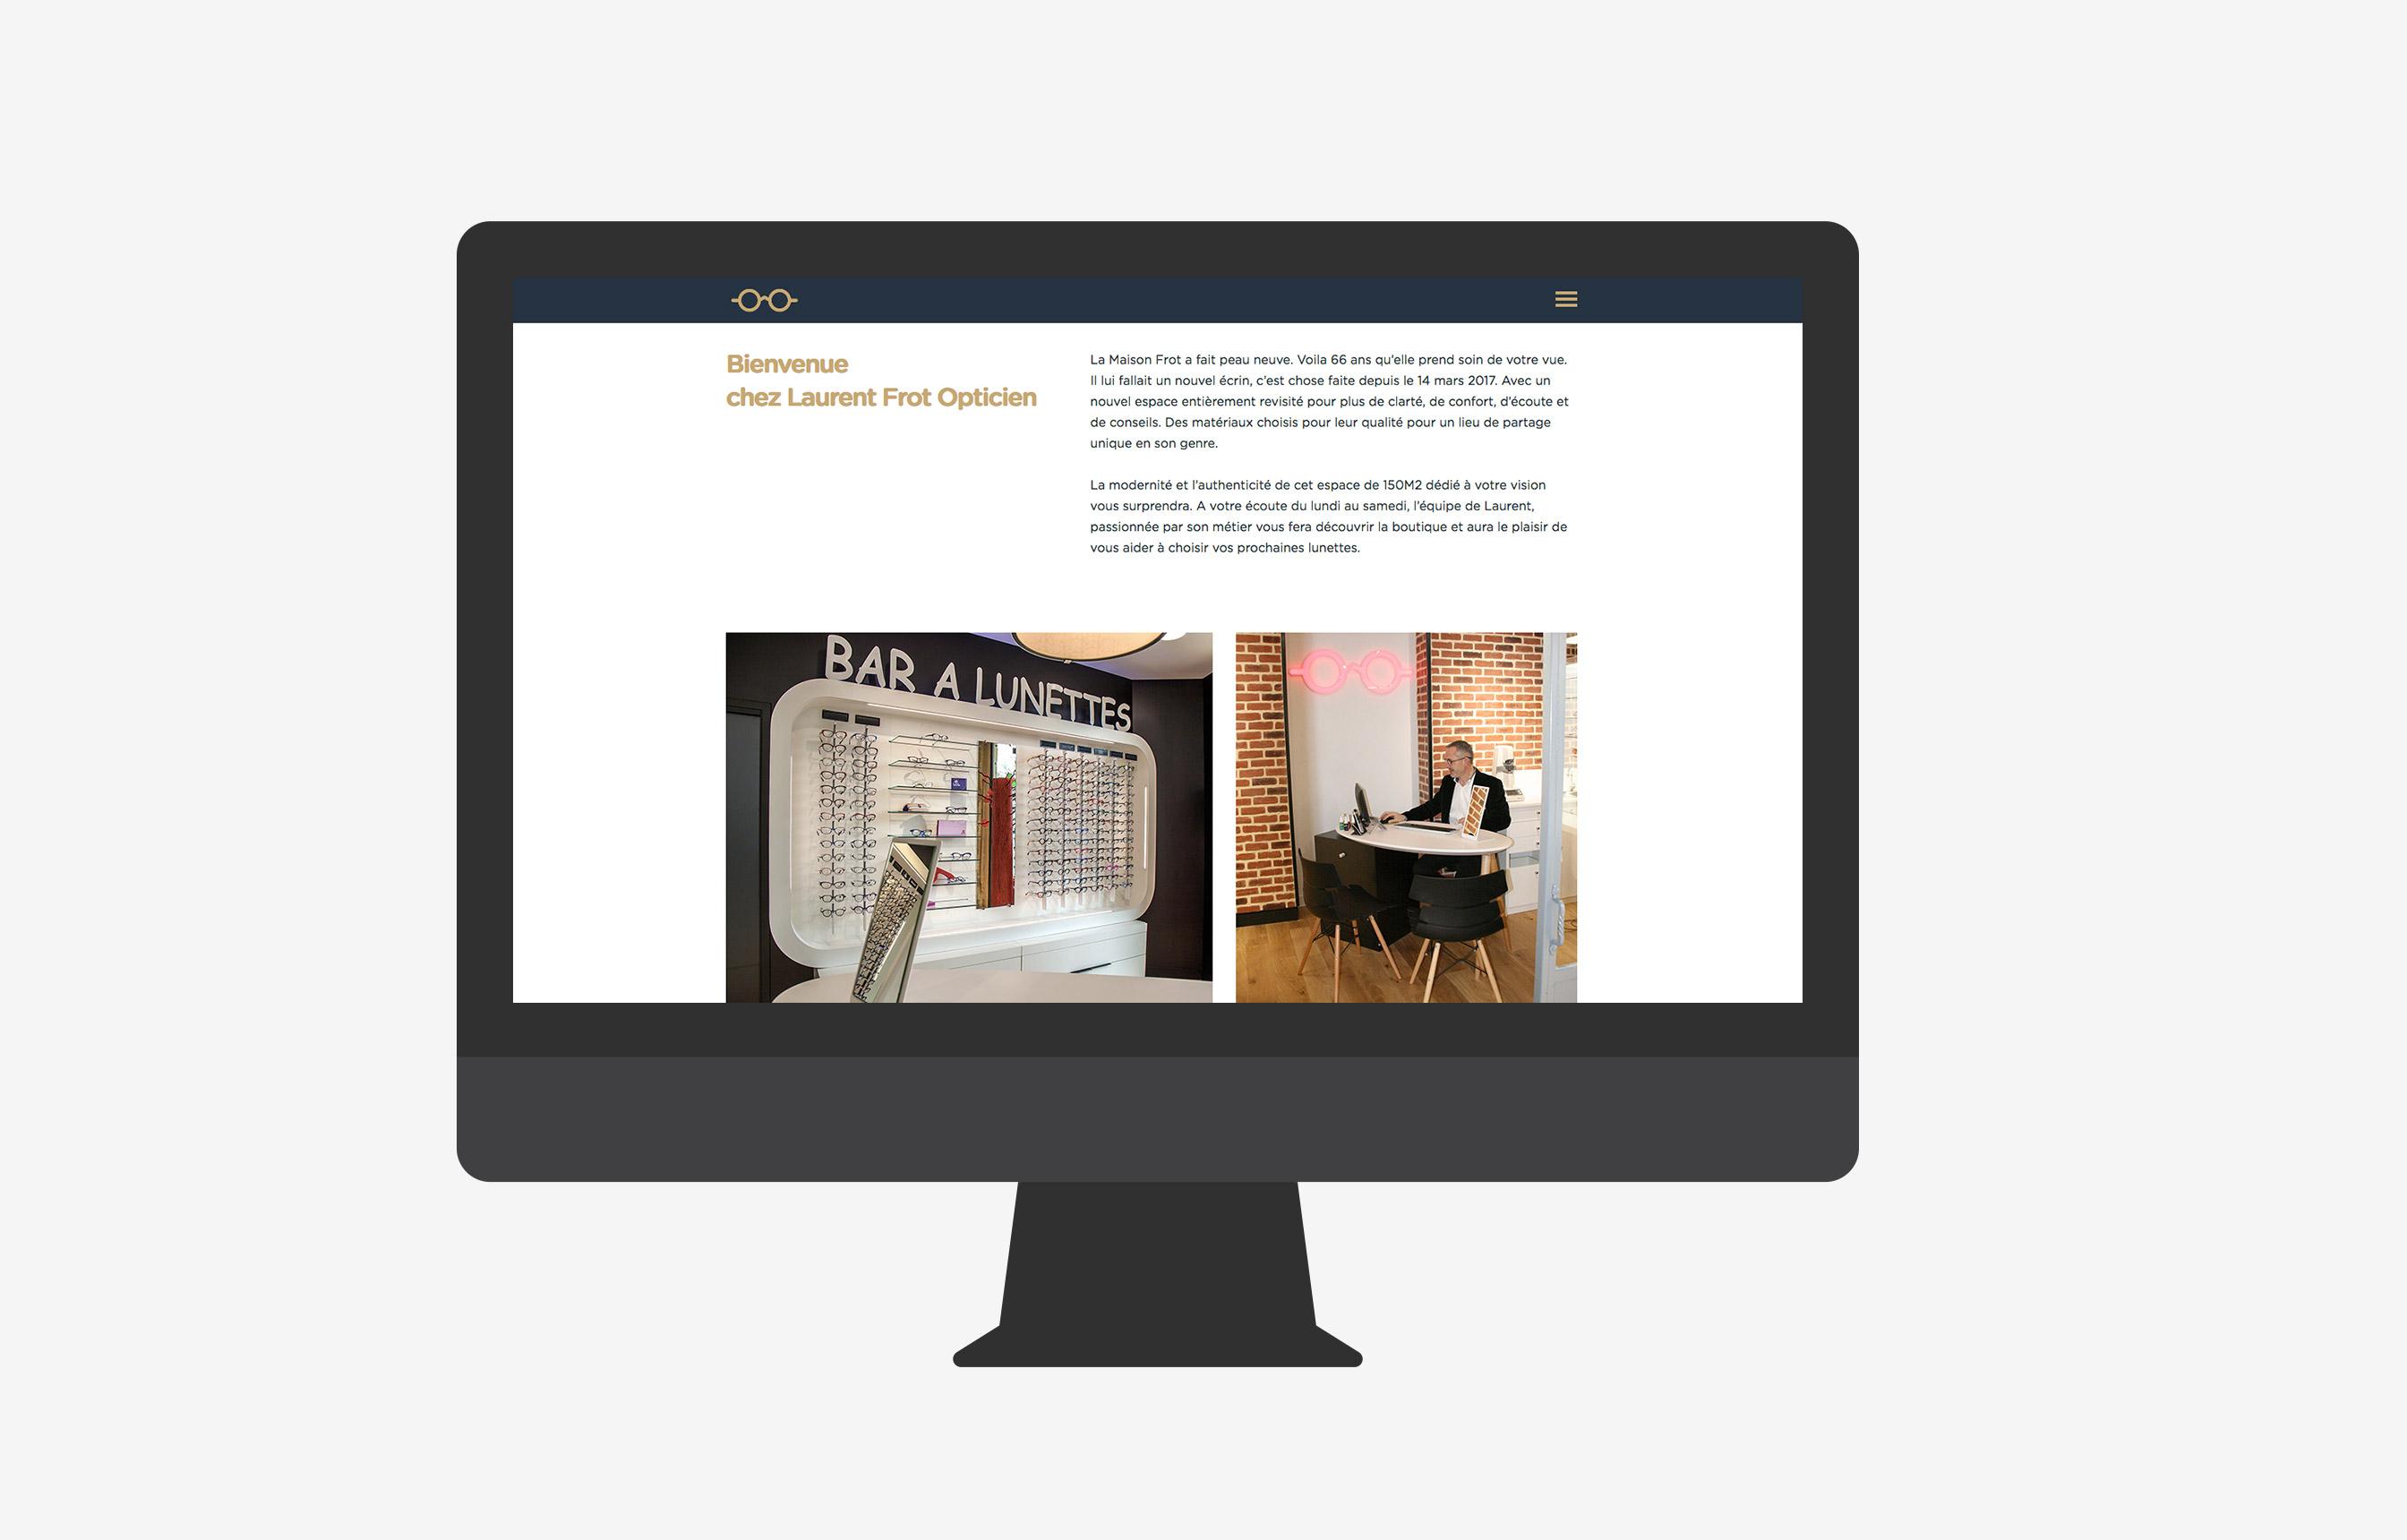 04-laurent-frot-opticien-logotype-pikteo-webdesign-graphic-design-freelance-paris-bruxelles-londres